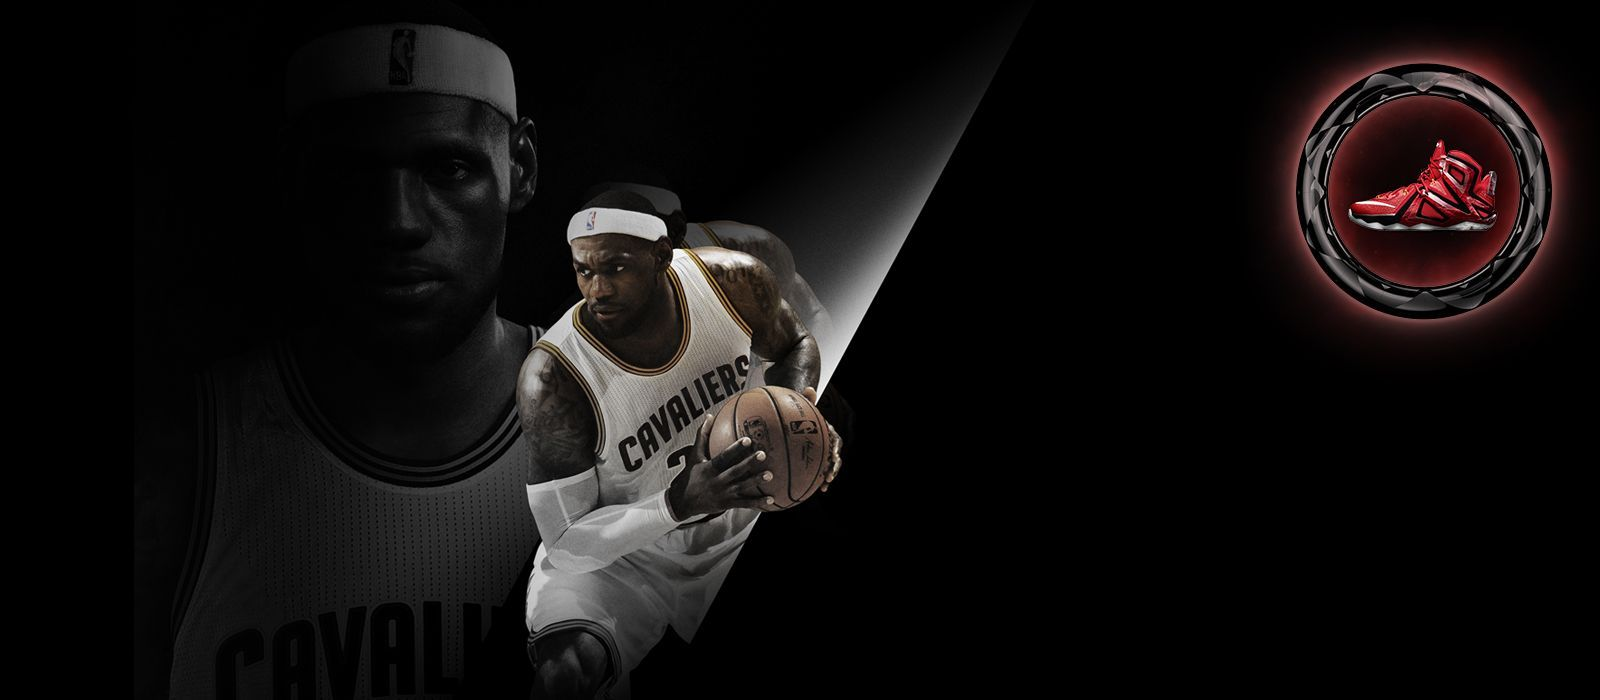 Nike Basketball: Black Mamba website | Black mamba, Nike basketball and  Website